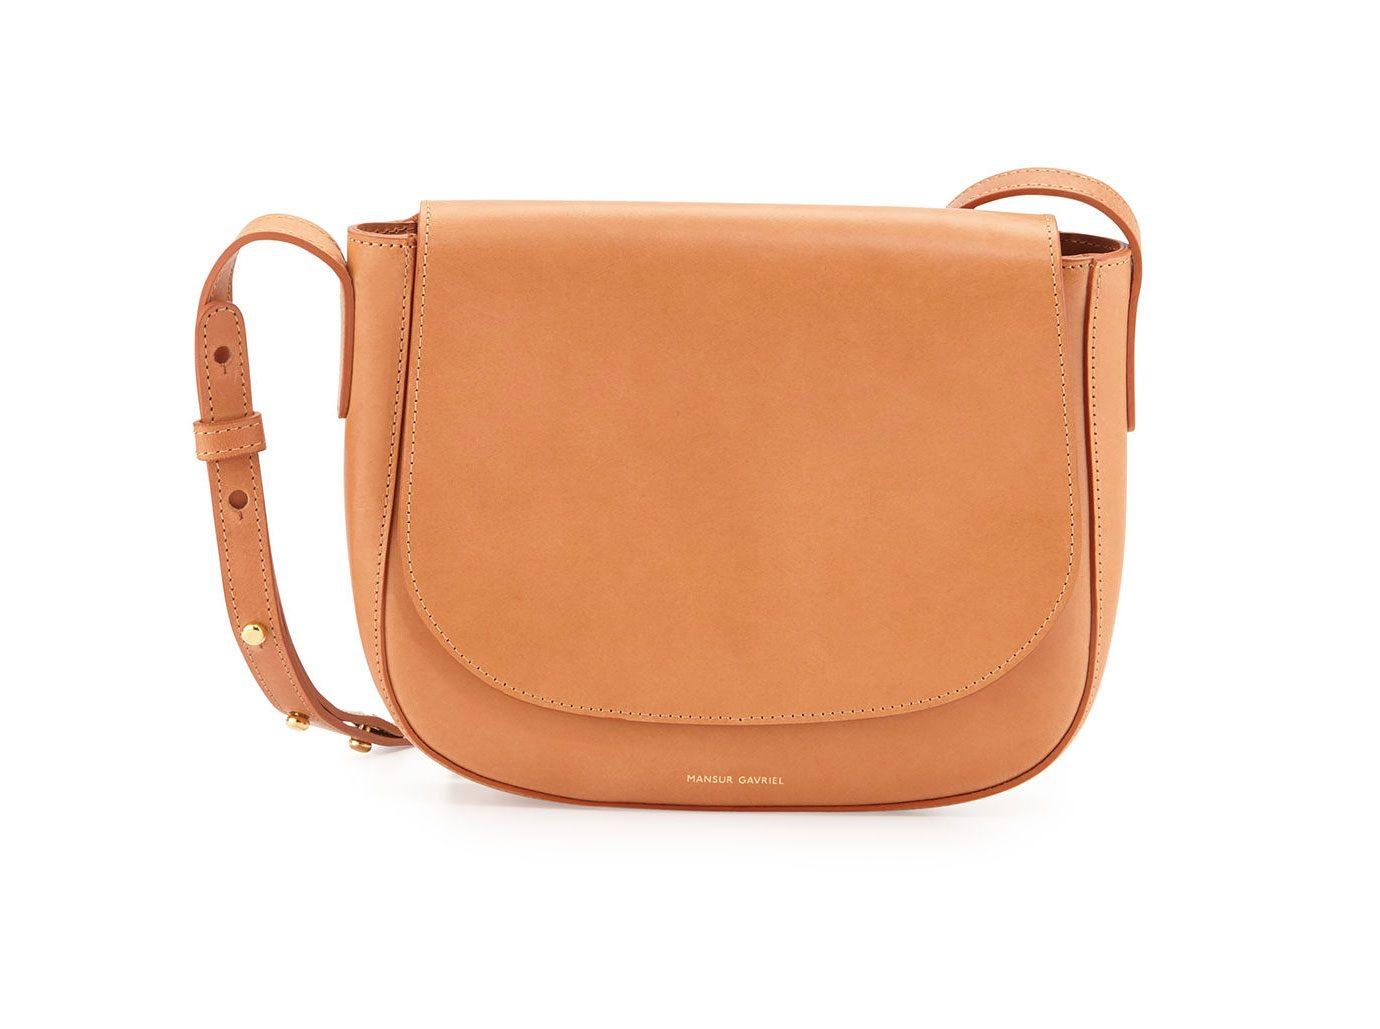 Mansur Gavriel Vegetable-Tanned Leather Crossbody Bag